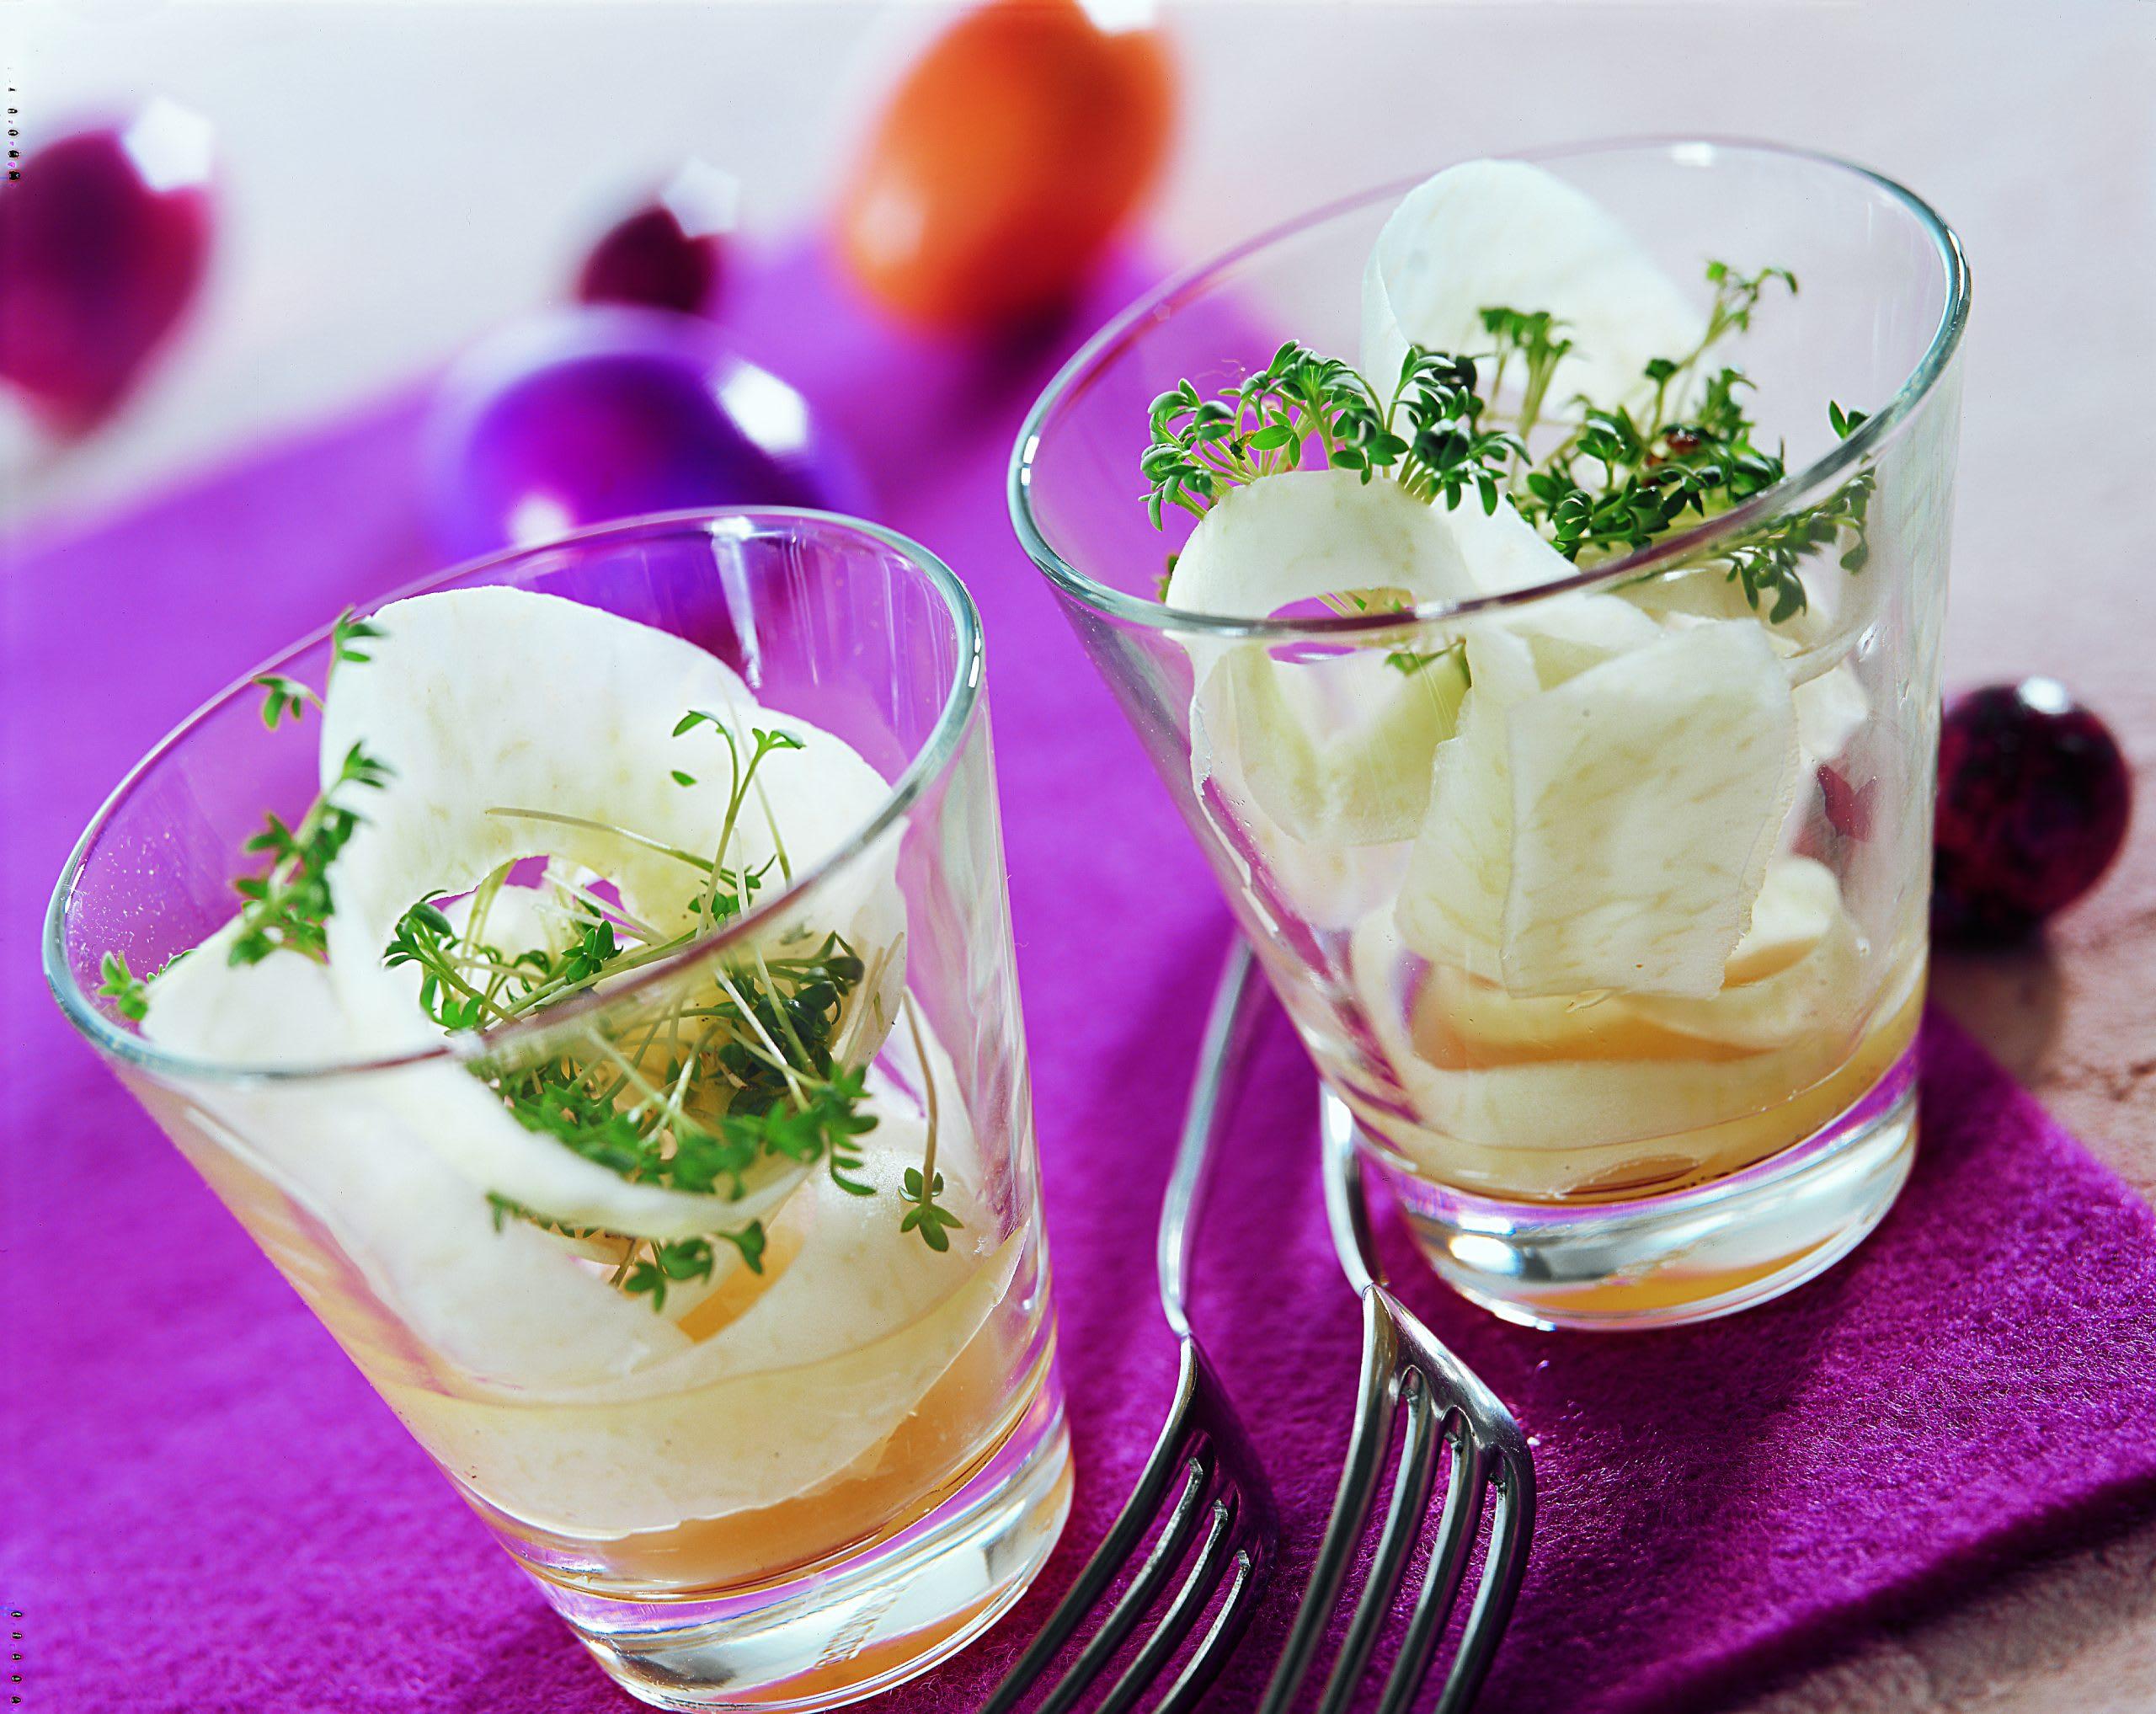 Kohlrabi-Kresse-Salat mit Vanille-Vinaigrette